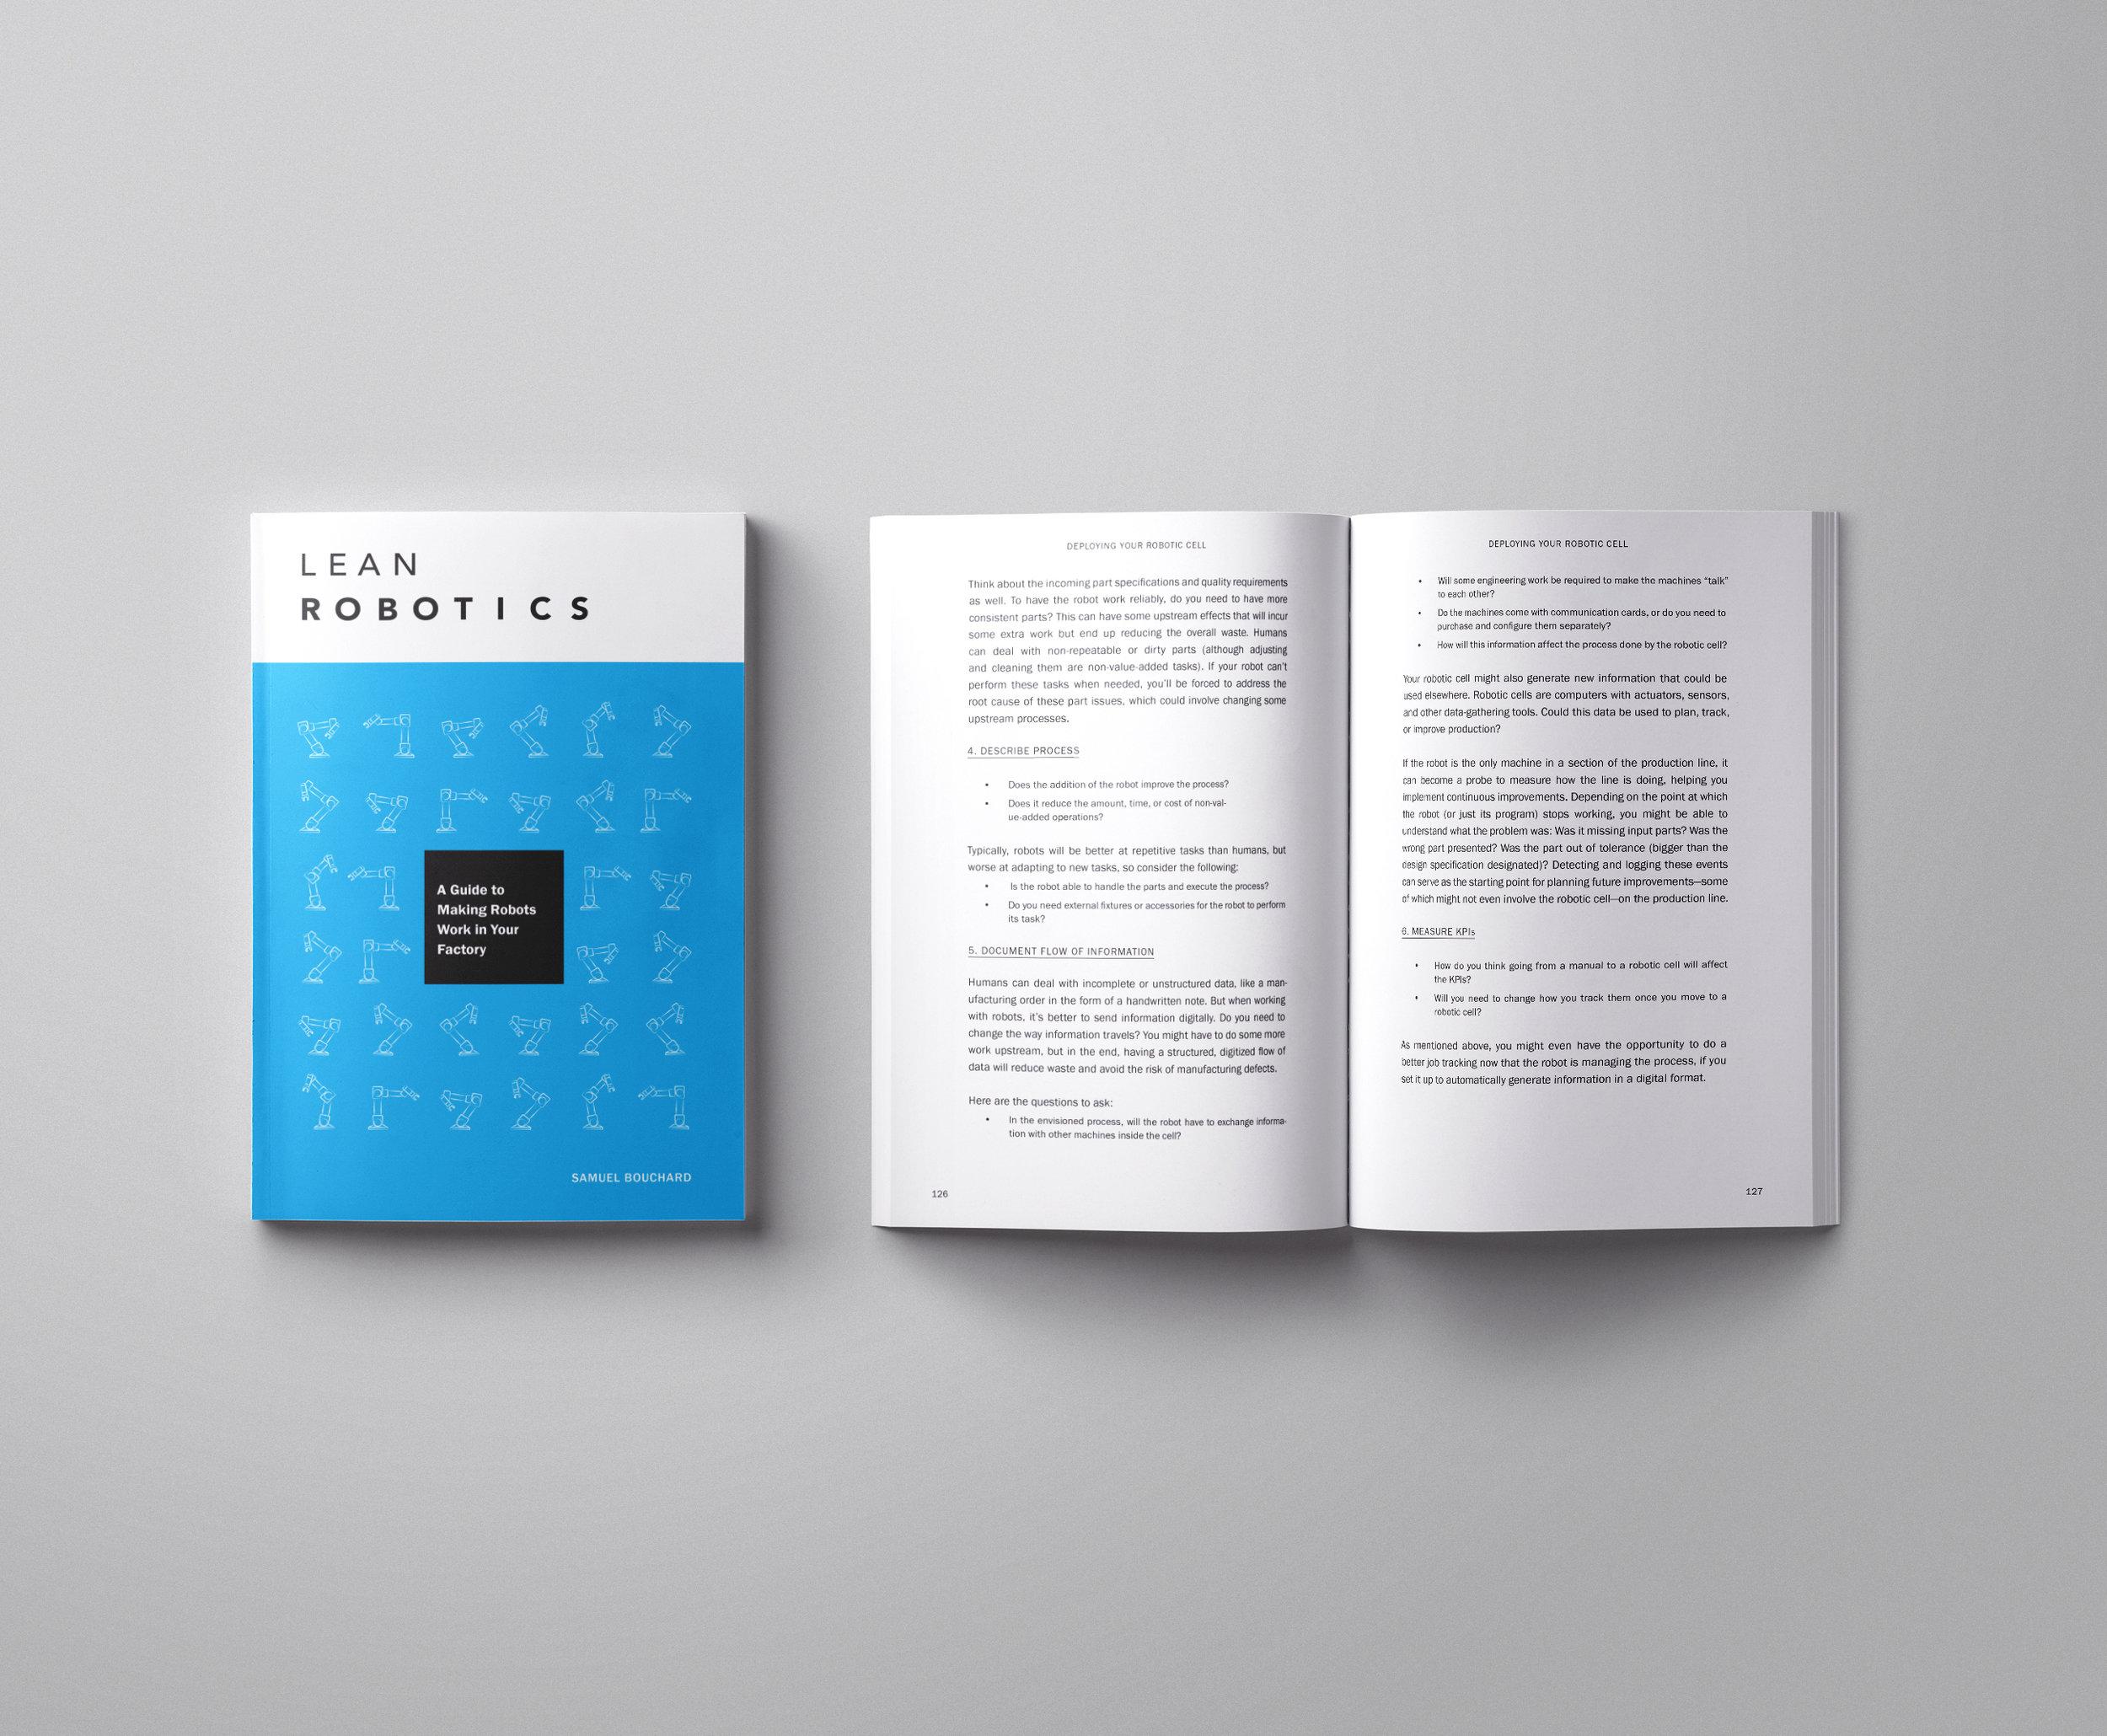 LR-Book-2.jpg